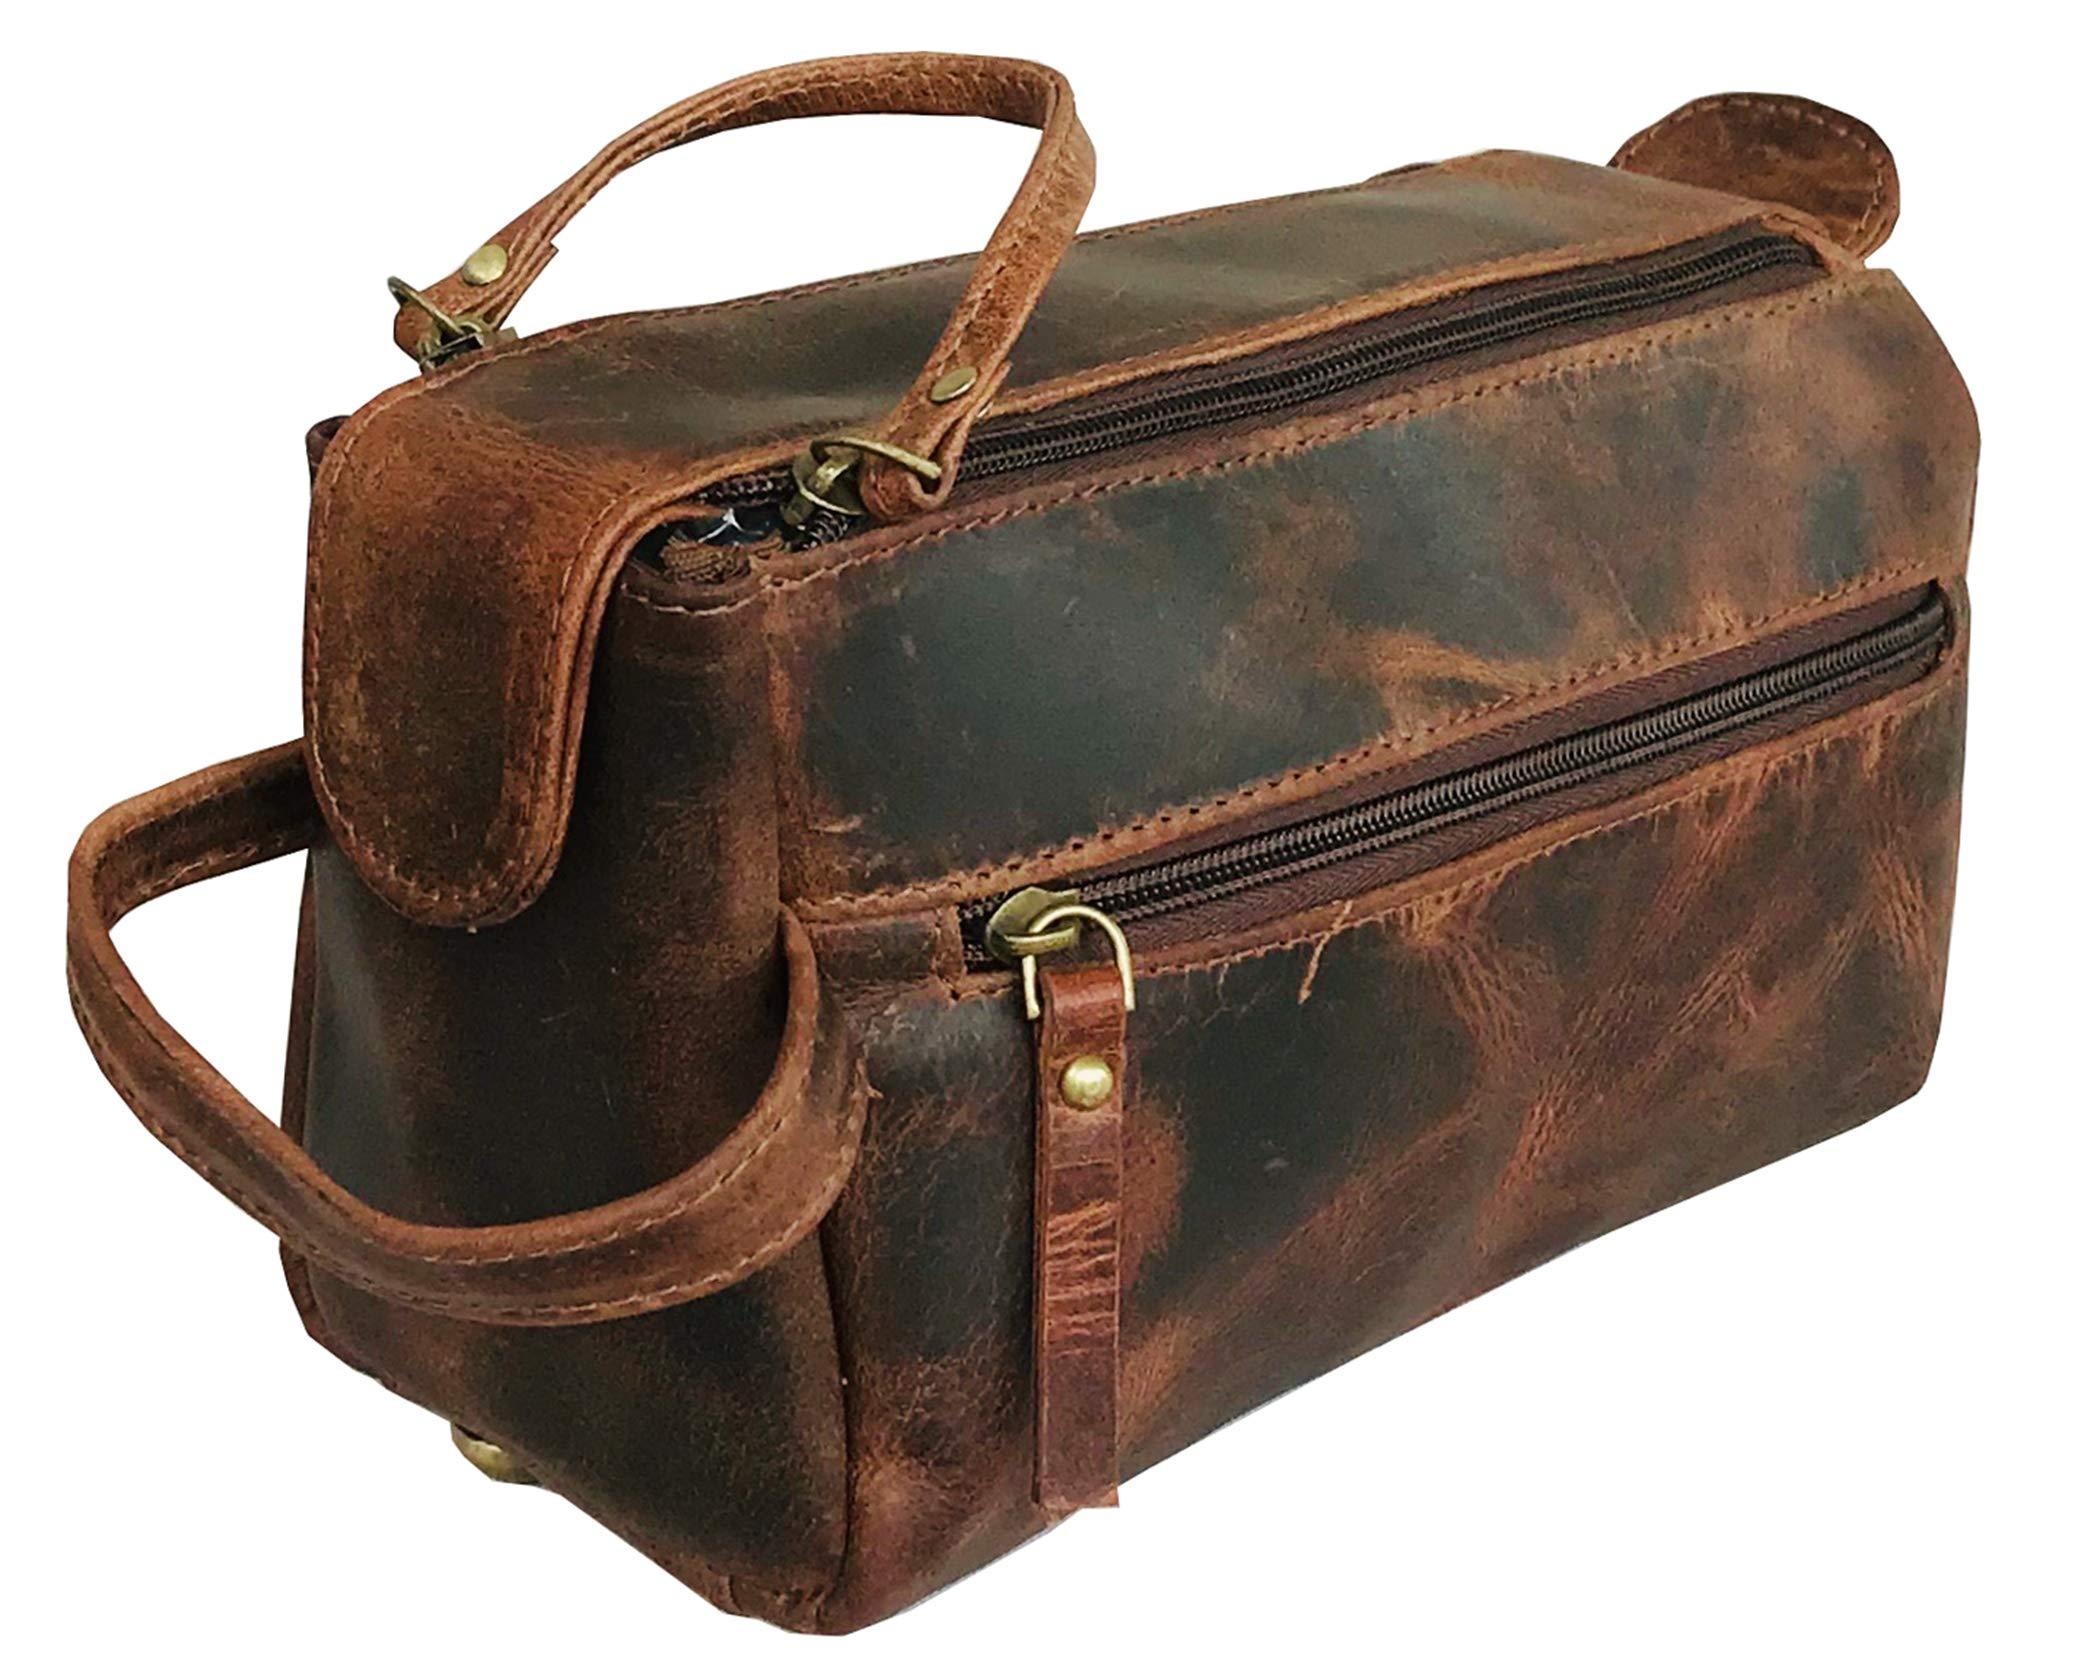 Genuine Buffalo Leather Unisex Toiletry Bag Travel Dopp Kit by Ruzioon